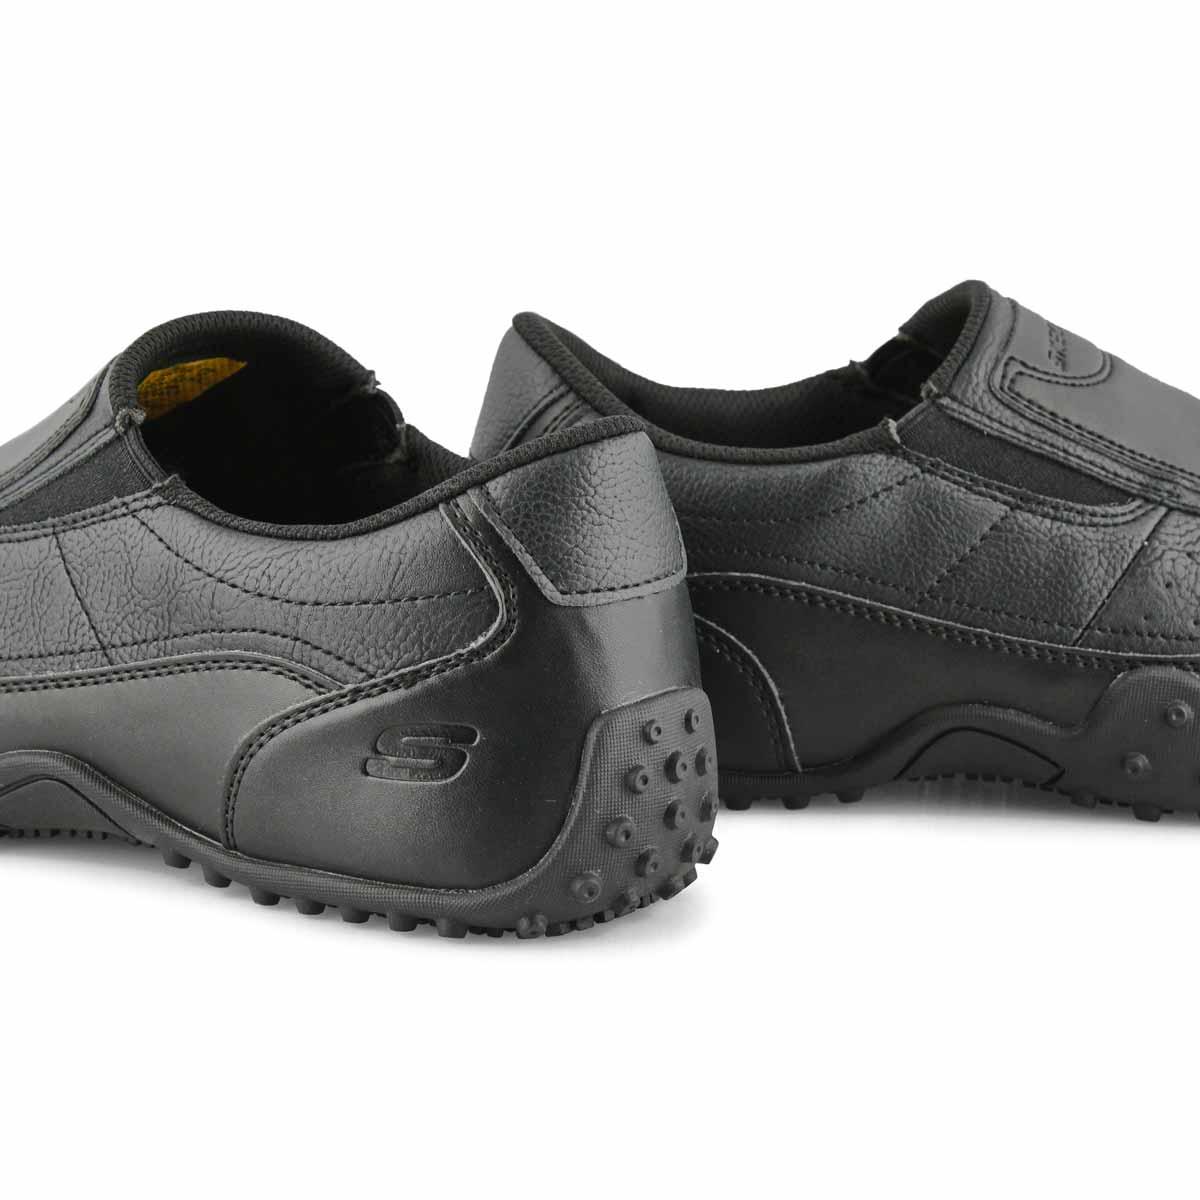 Mns Elston Kasari blk slipresistant shoe